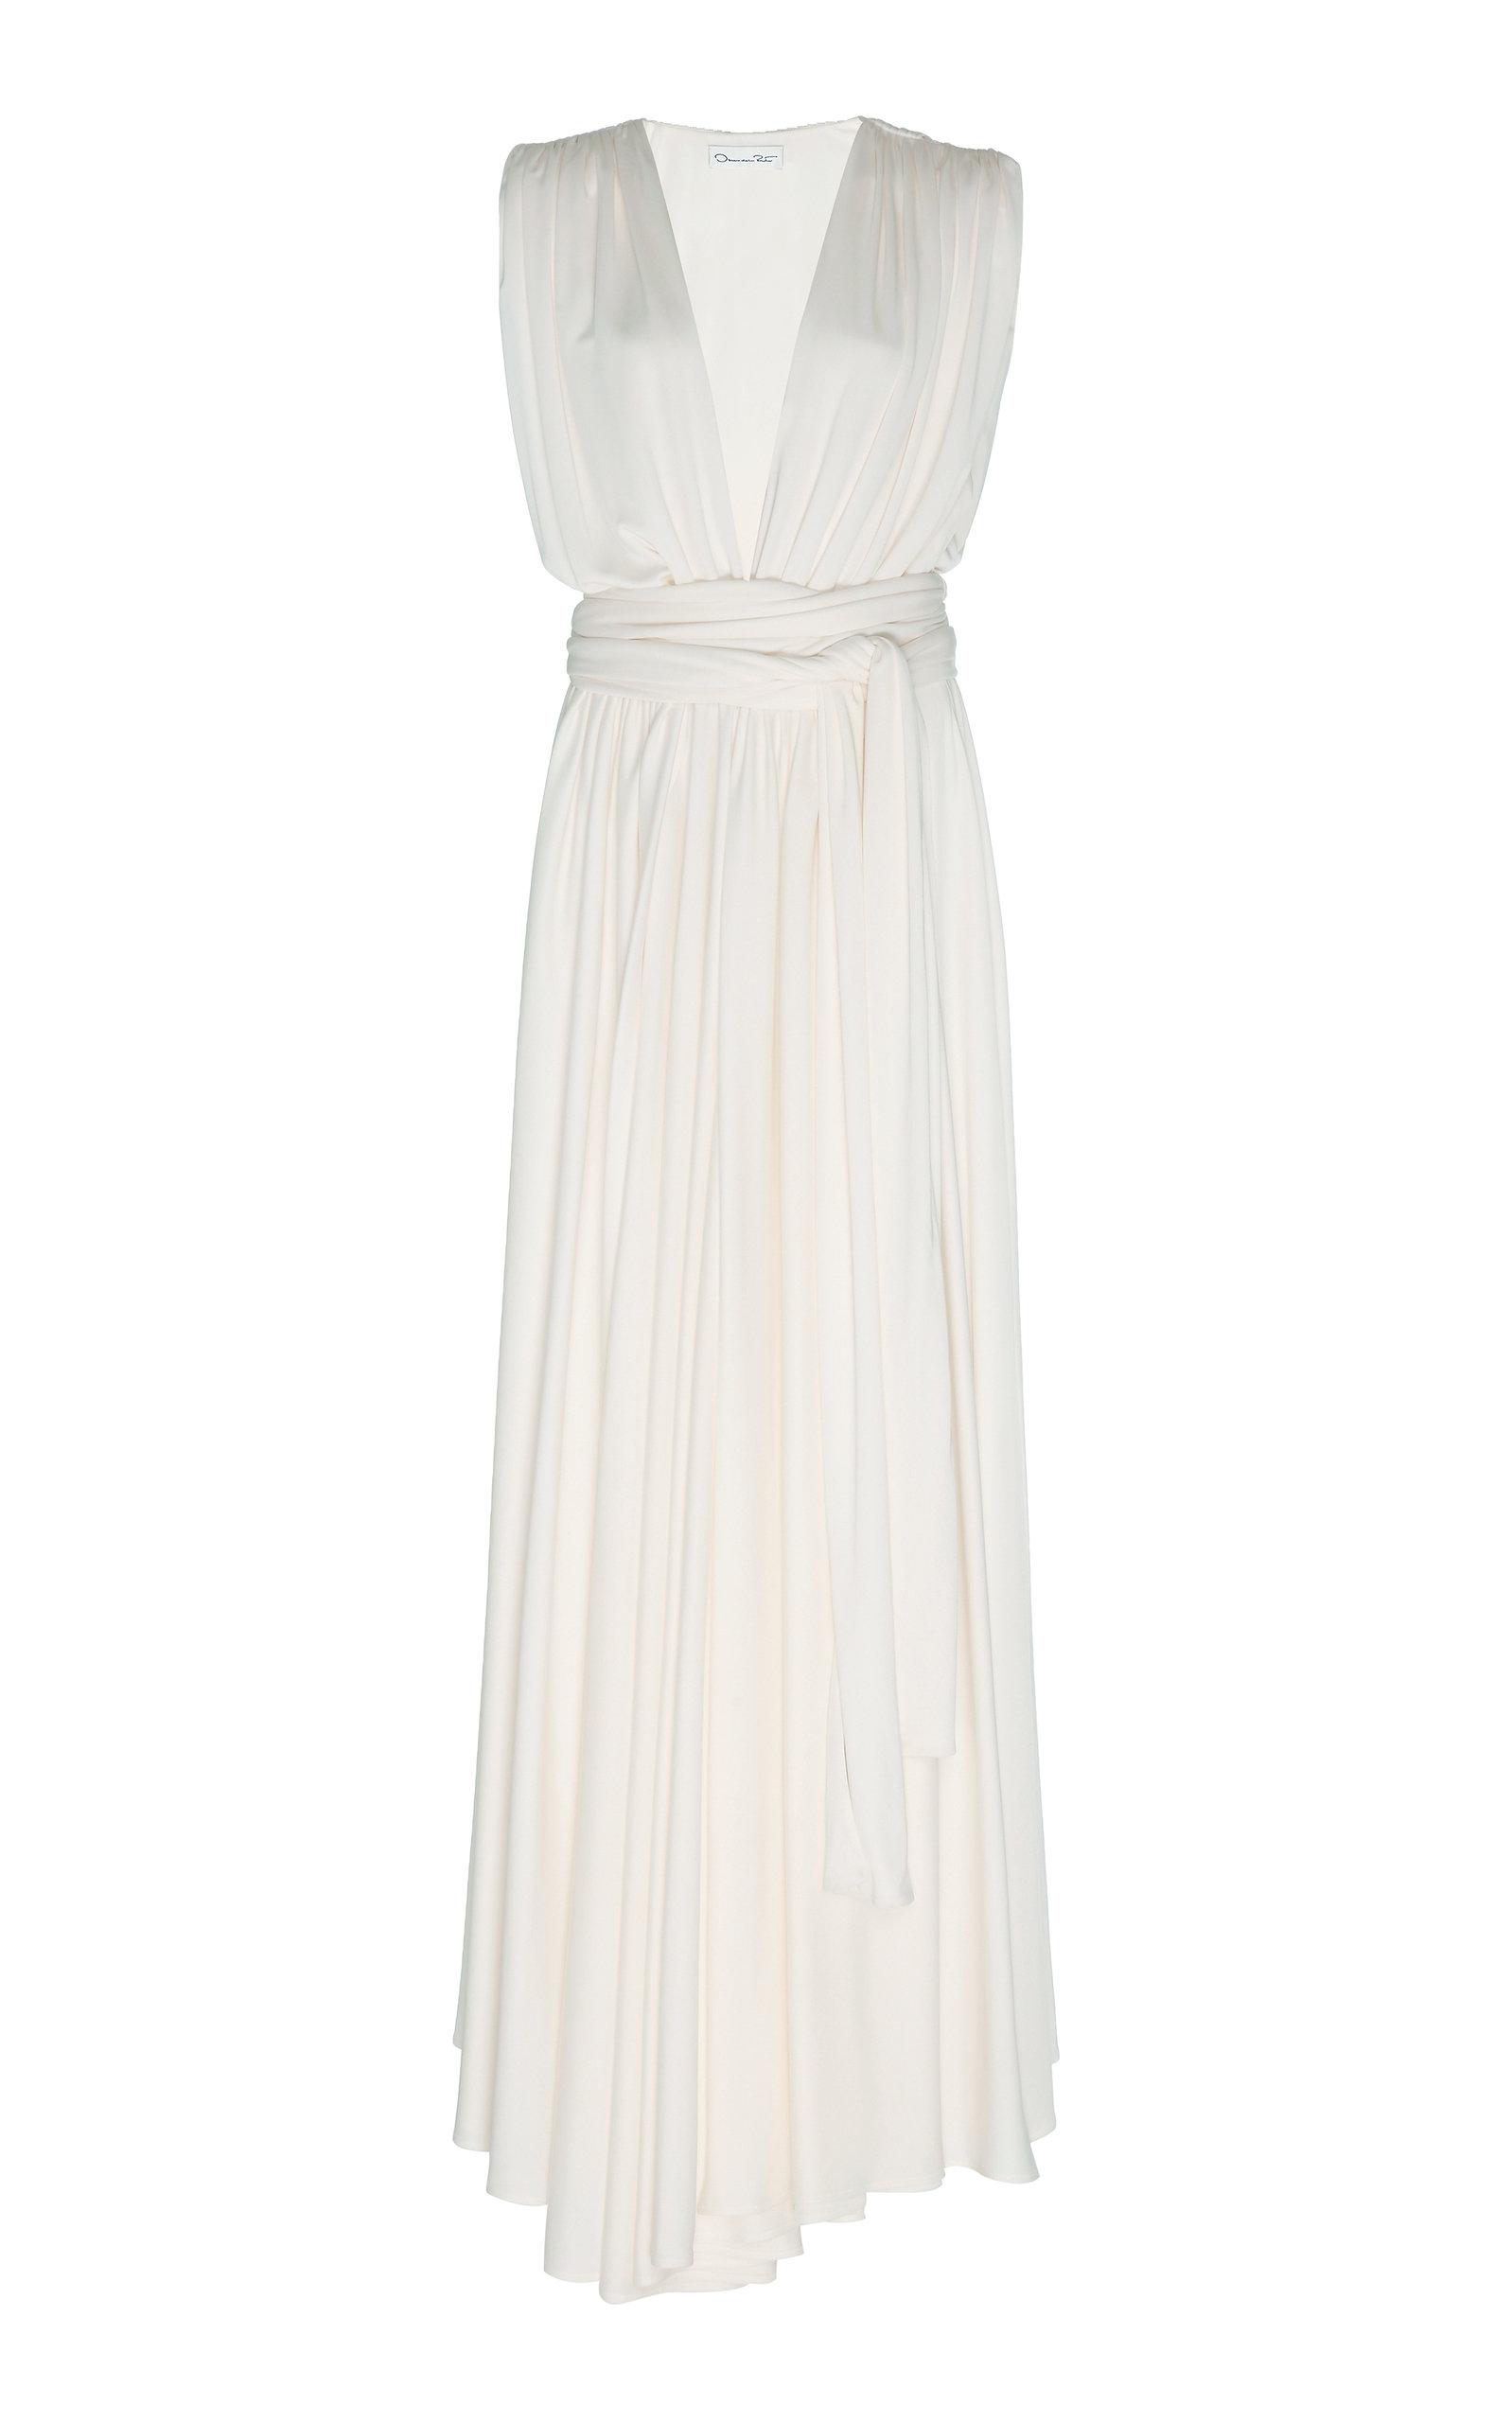 Buy Oscar de la Renta Gathered Jersey Maxi Dress online, shop Oscar de la Renta at the best price